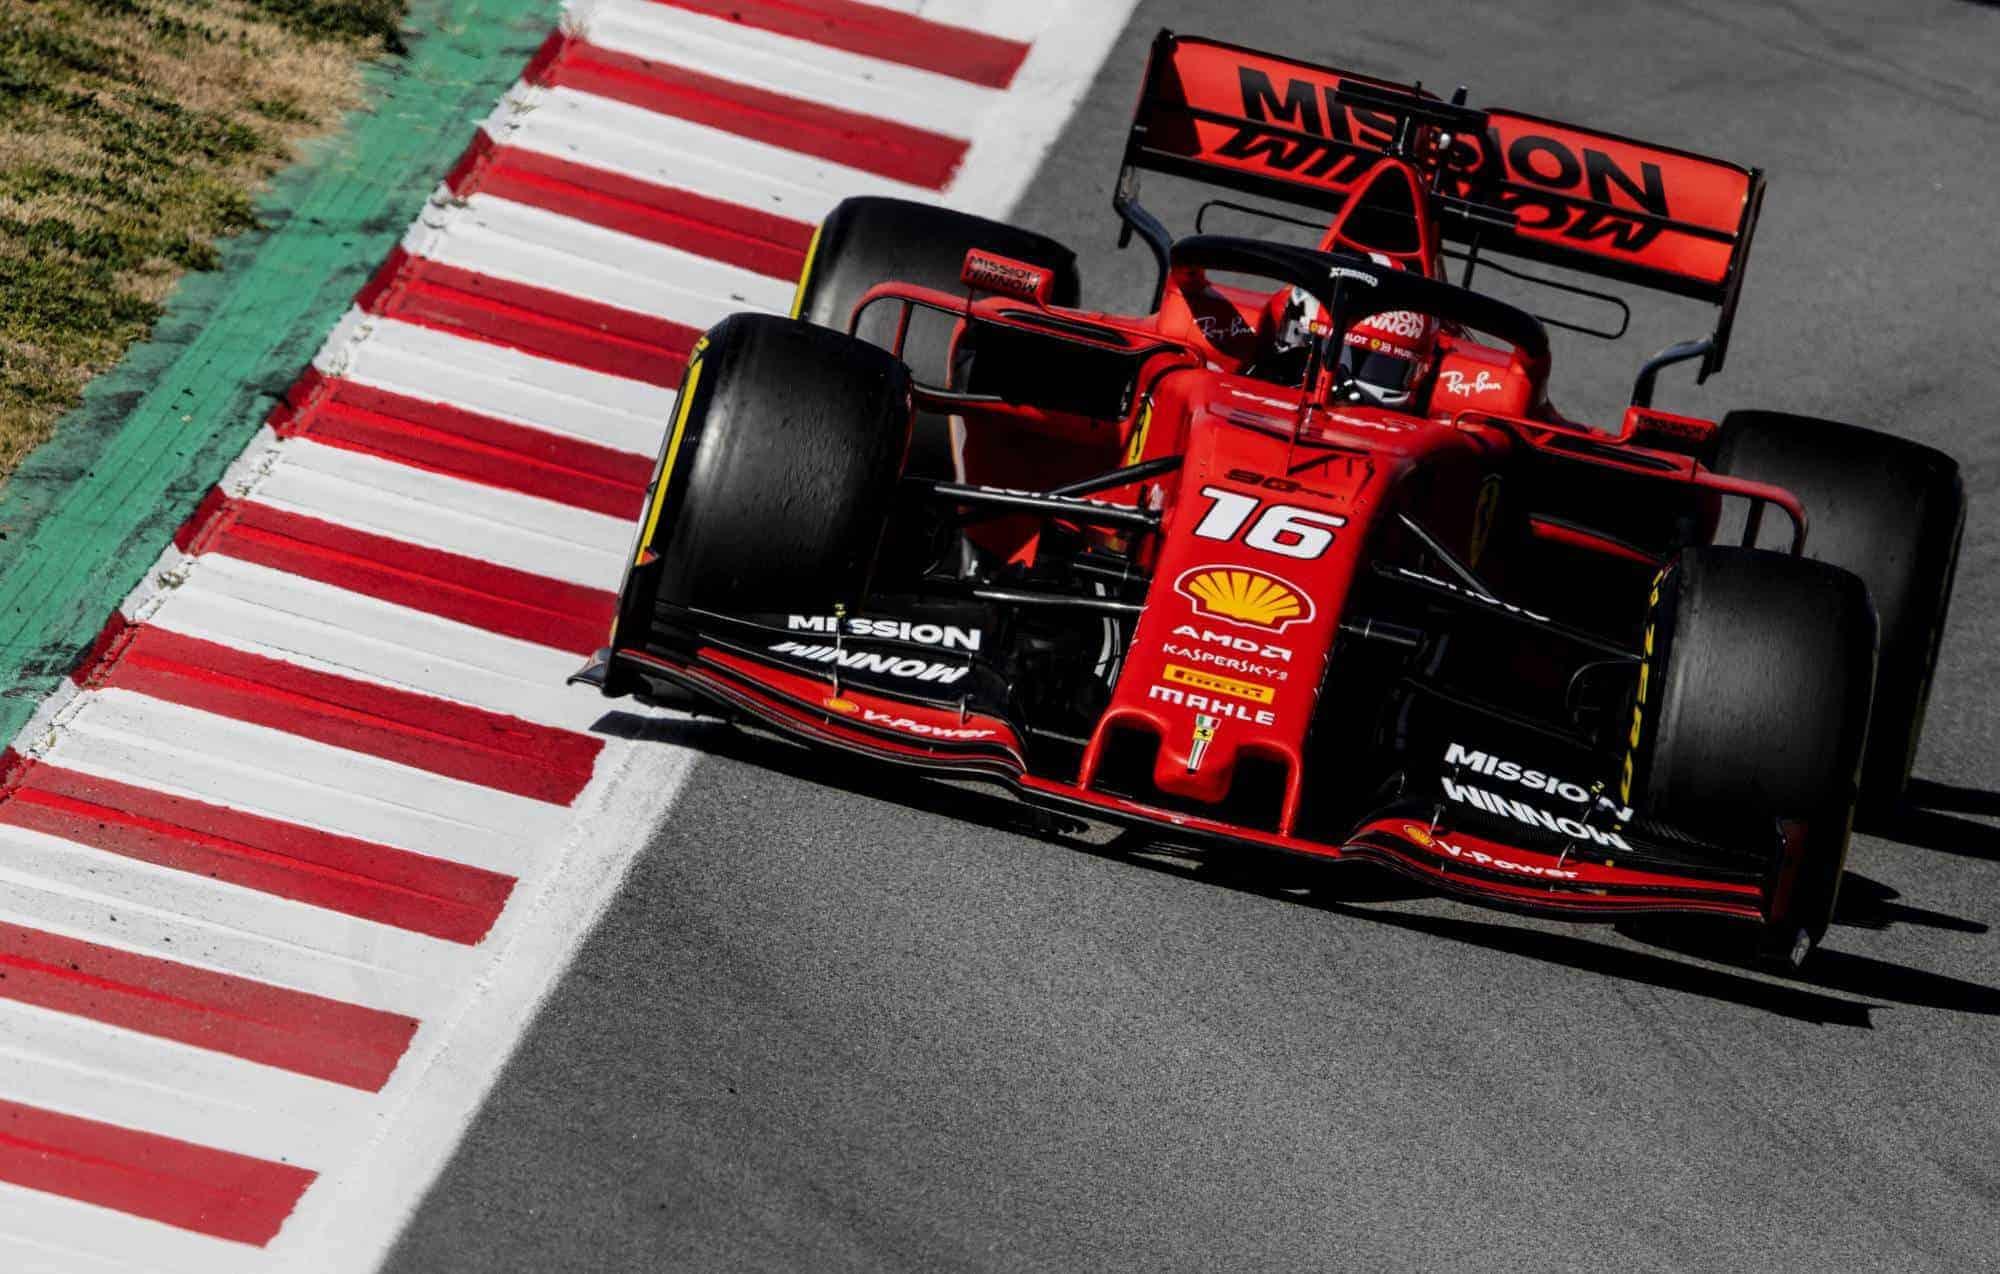 Charles Leclerc Ferrari SF90 Barcelona Test 2 C3 tyres Pirelli Photo Ferrari